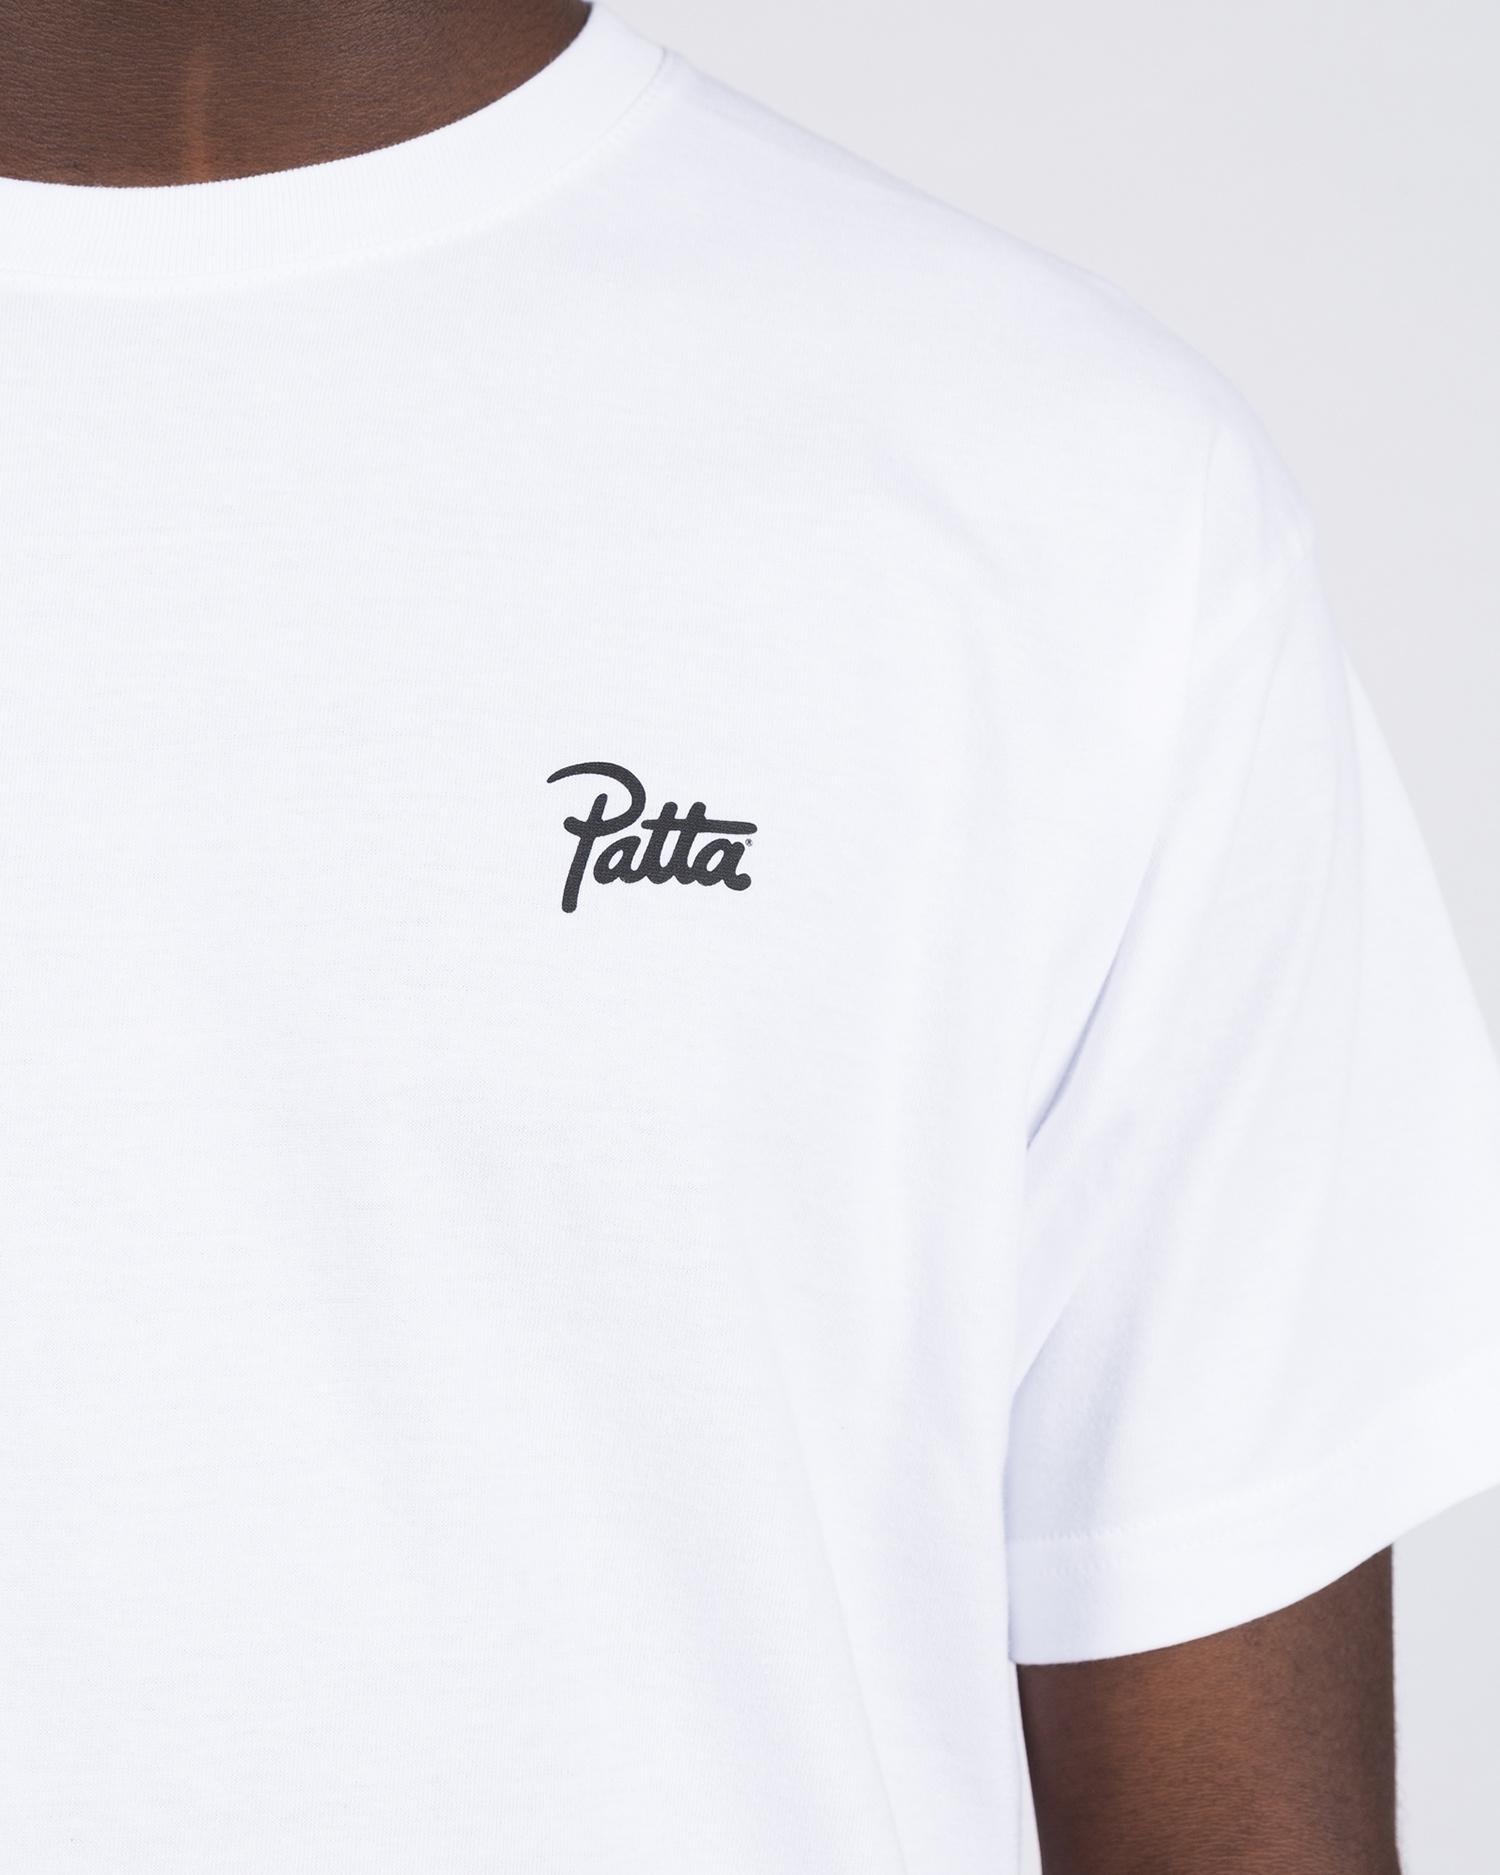 Patta Eternal Education T-shirt White